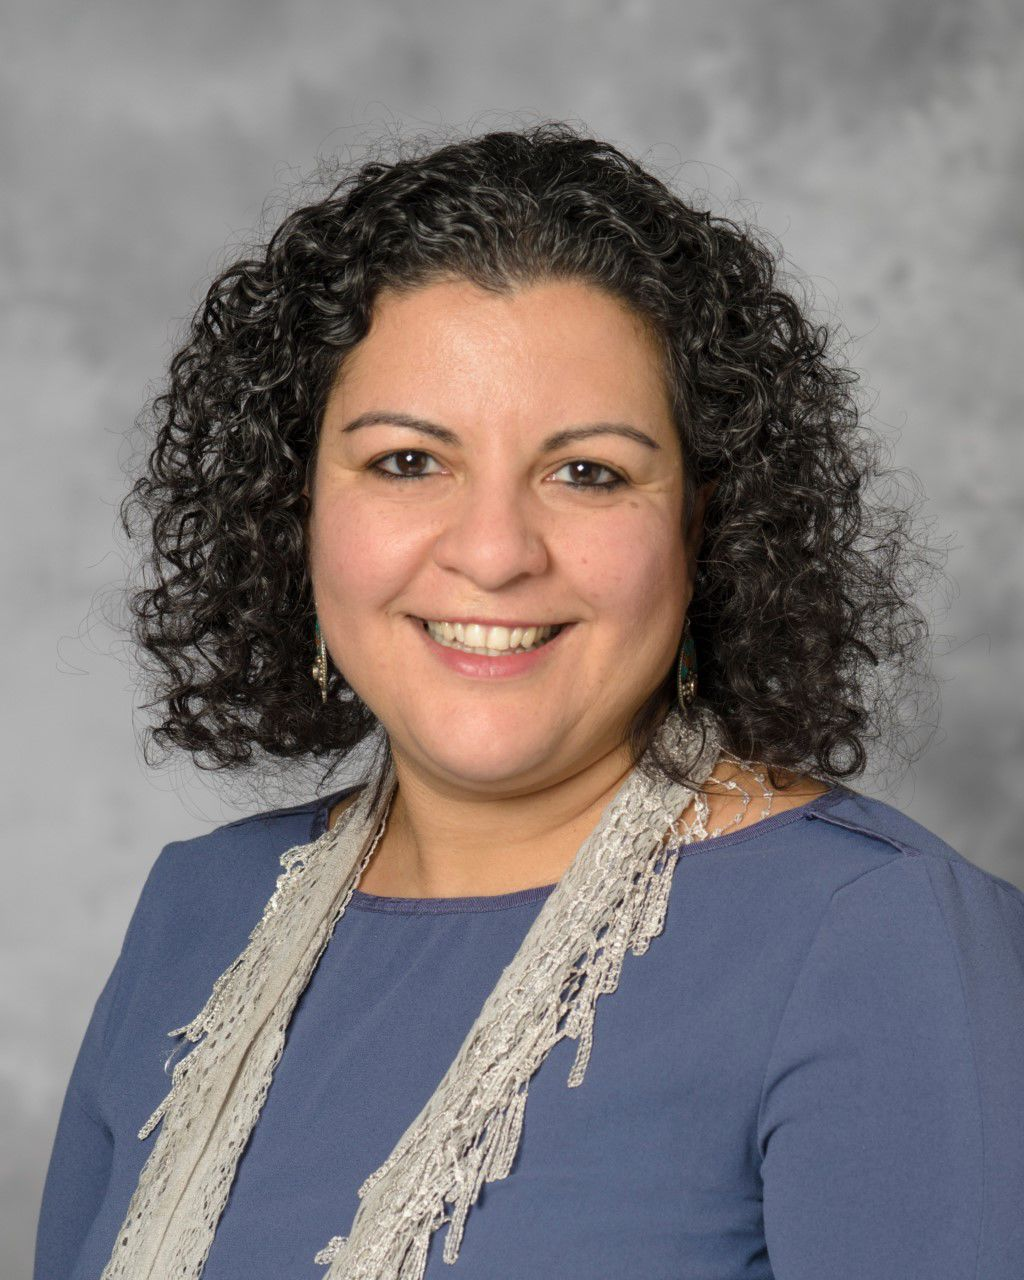 Dr. Noshene Ranjbar